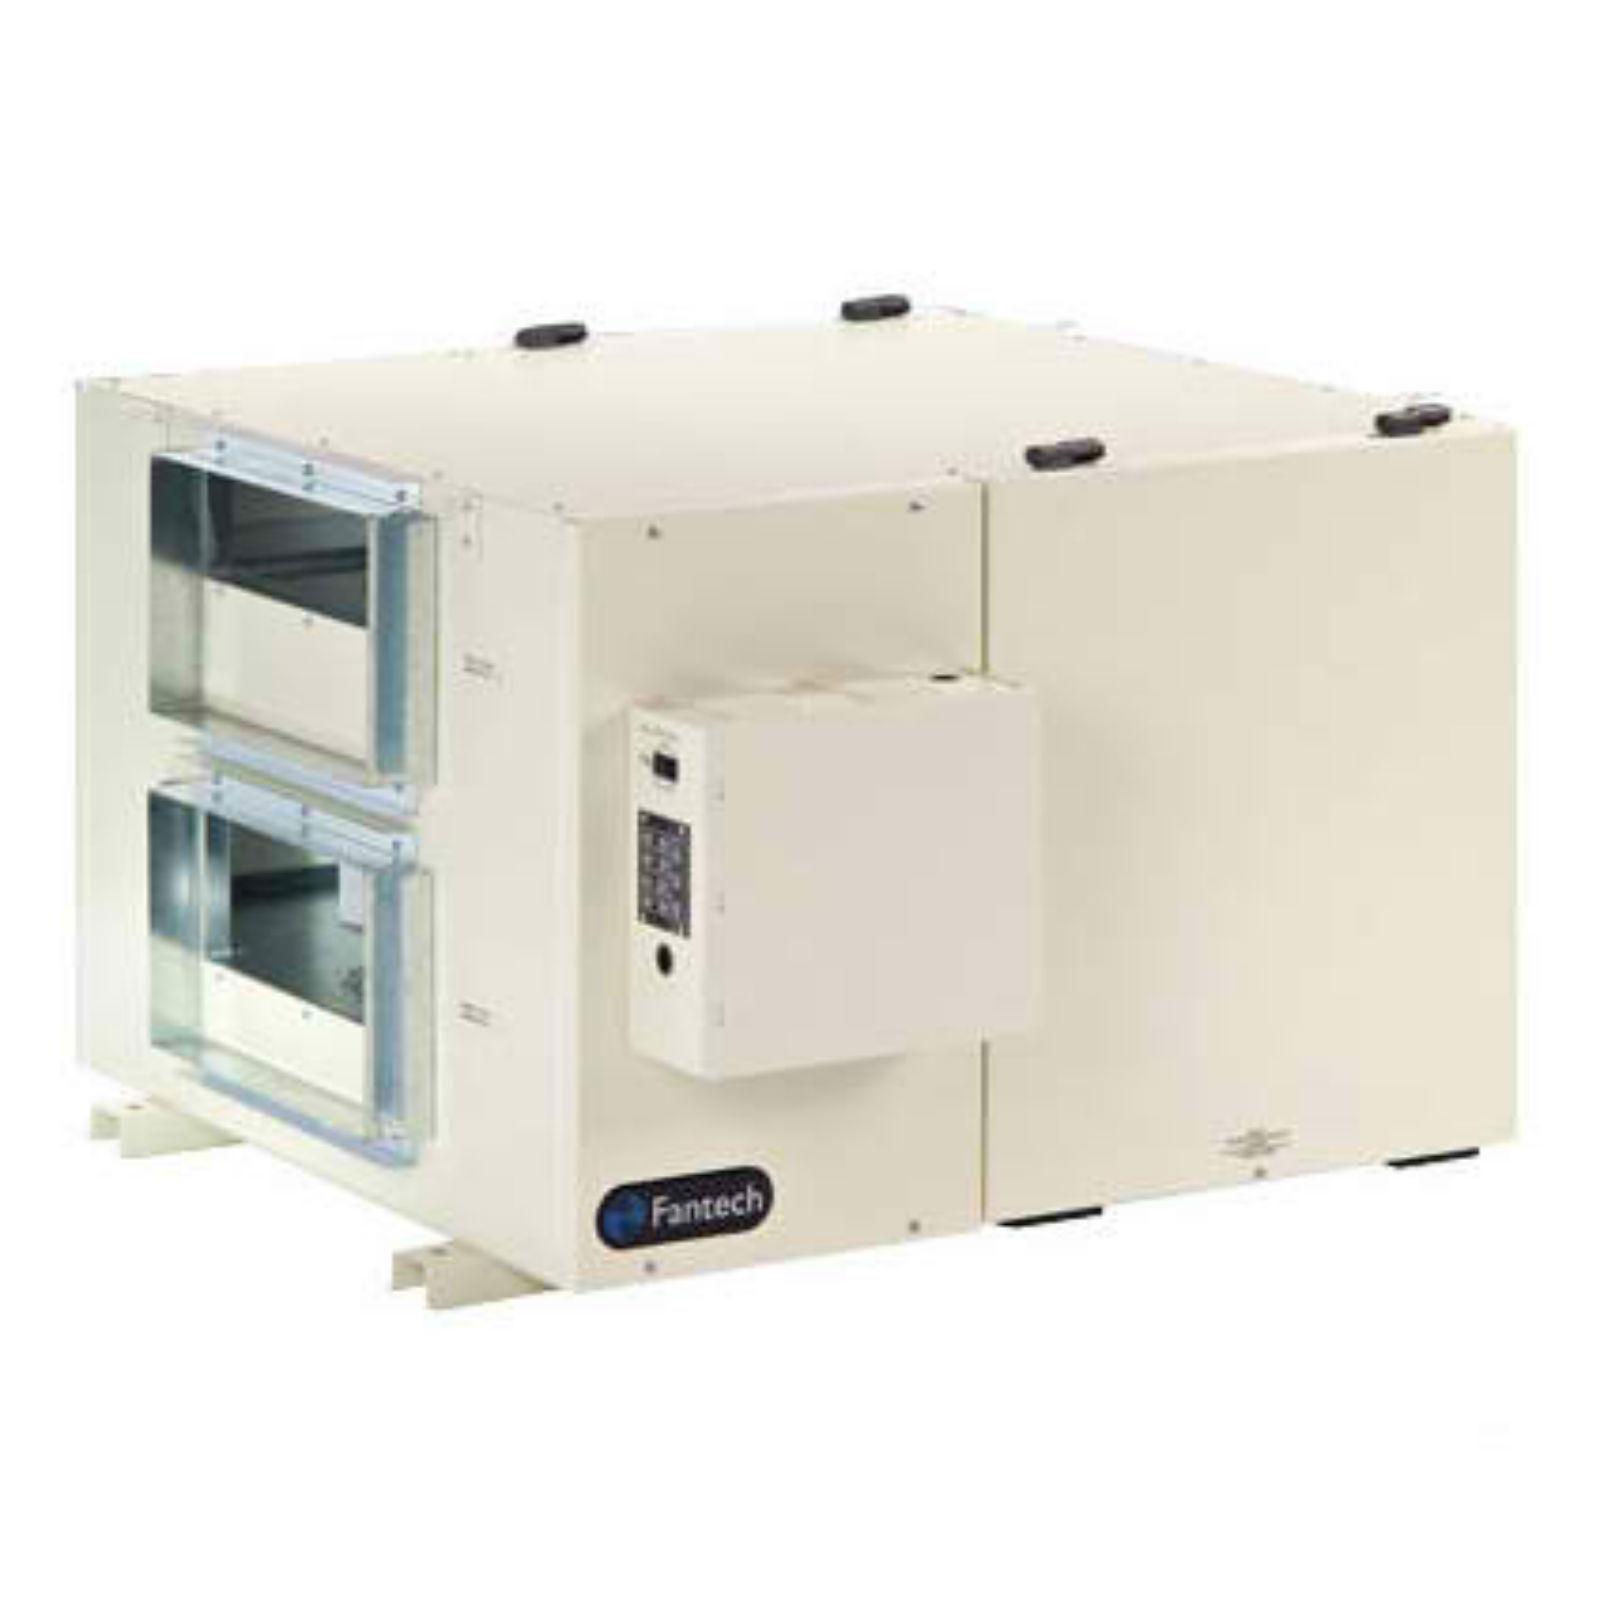 Fantech Heat Recovery Ventilator, 120 V, 1201 CFM at Sears.com